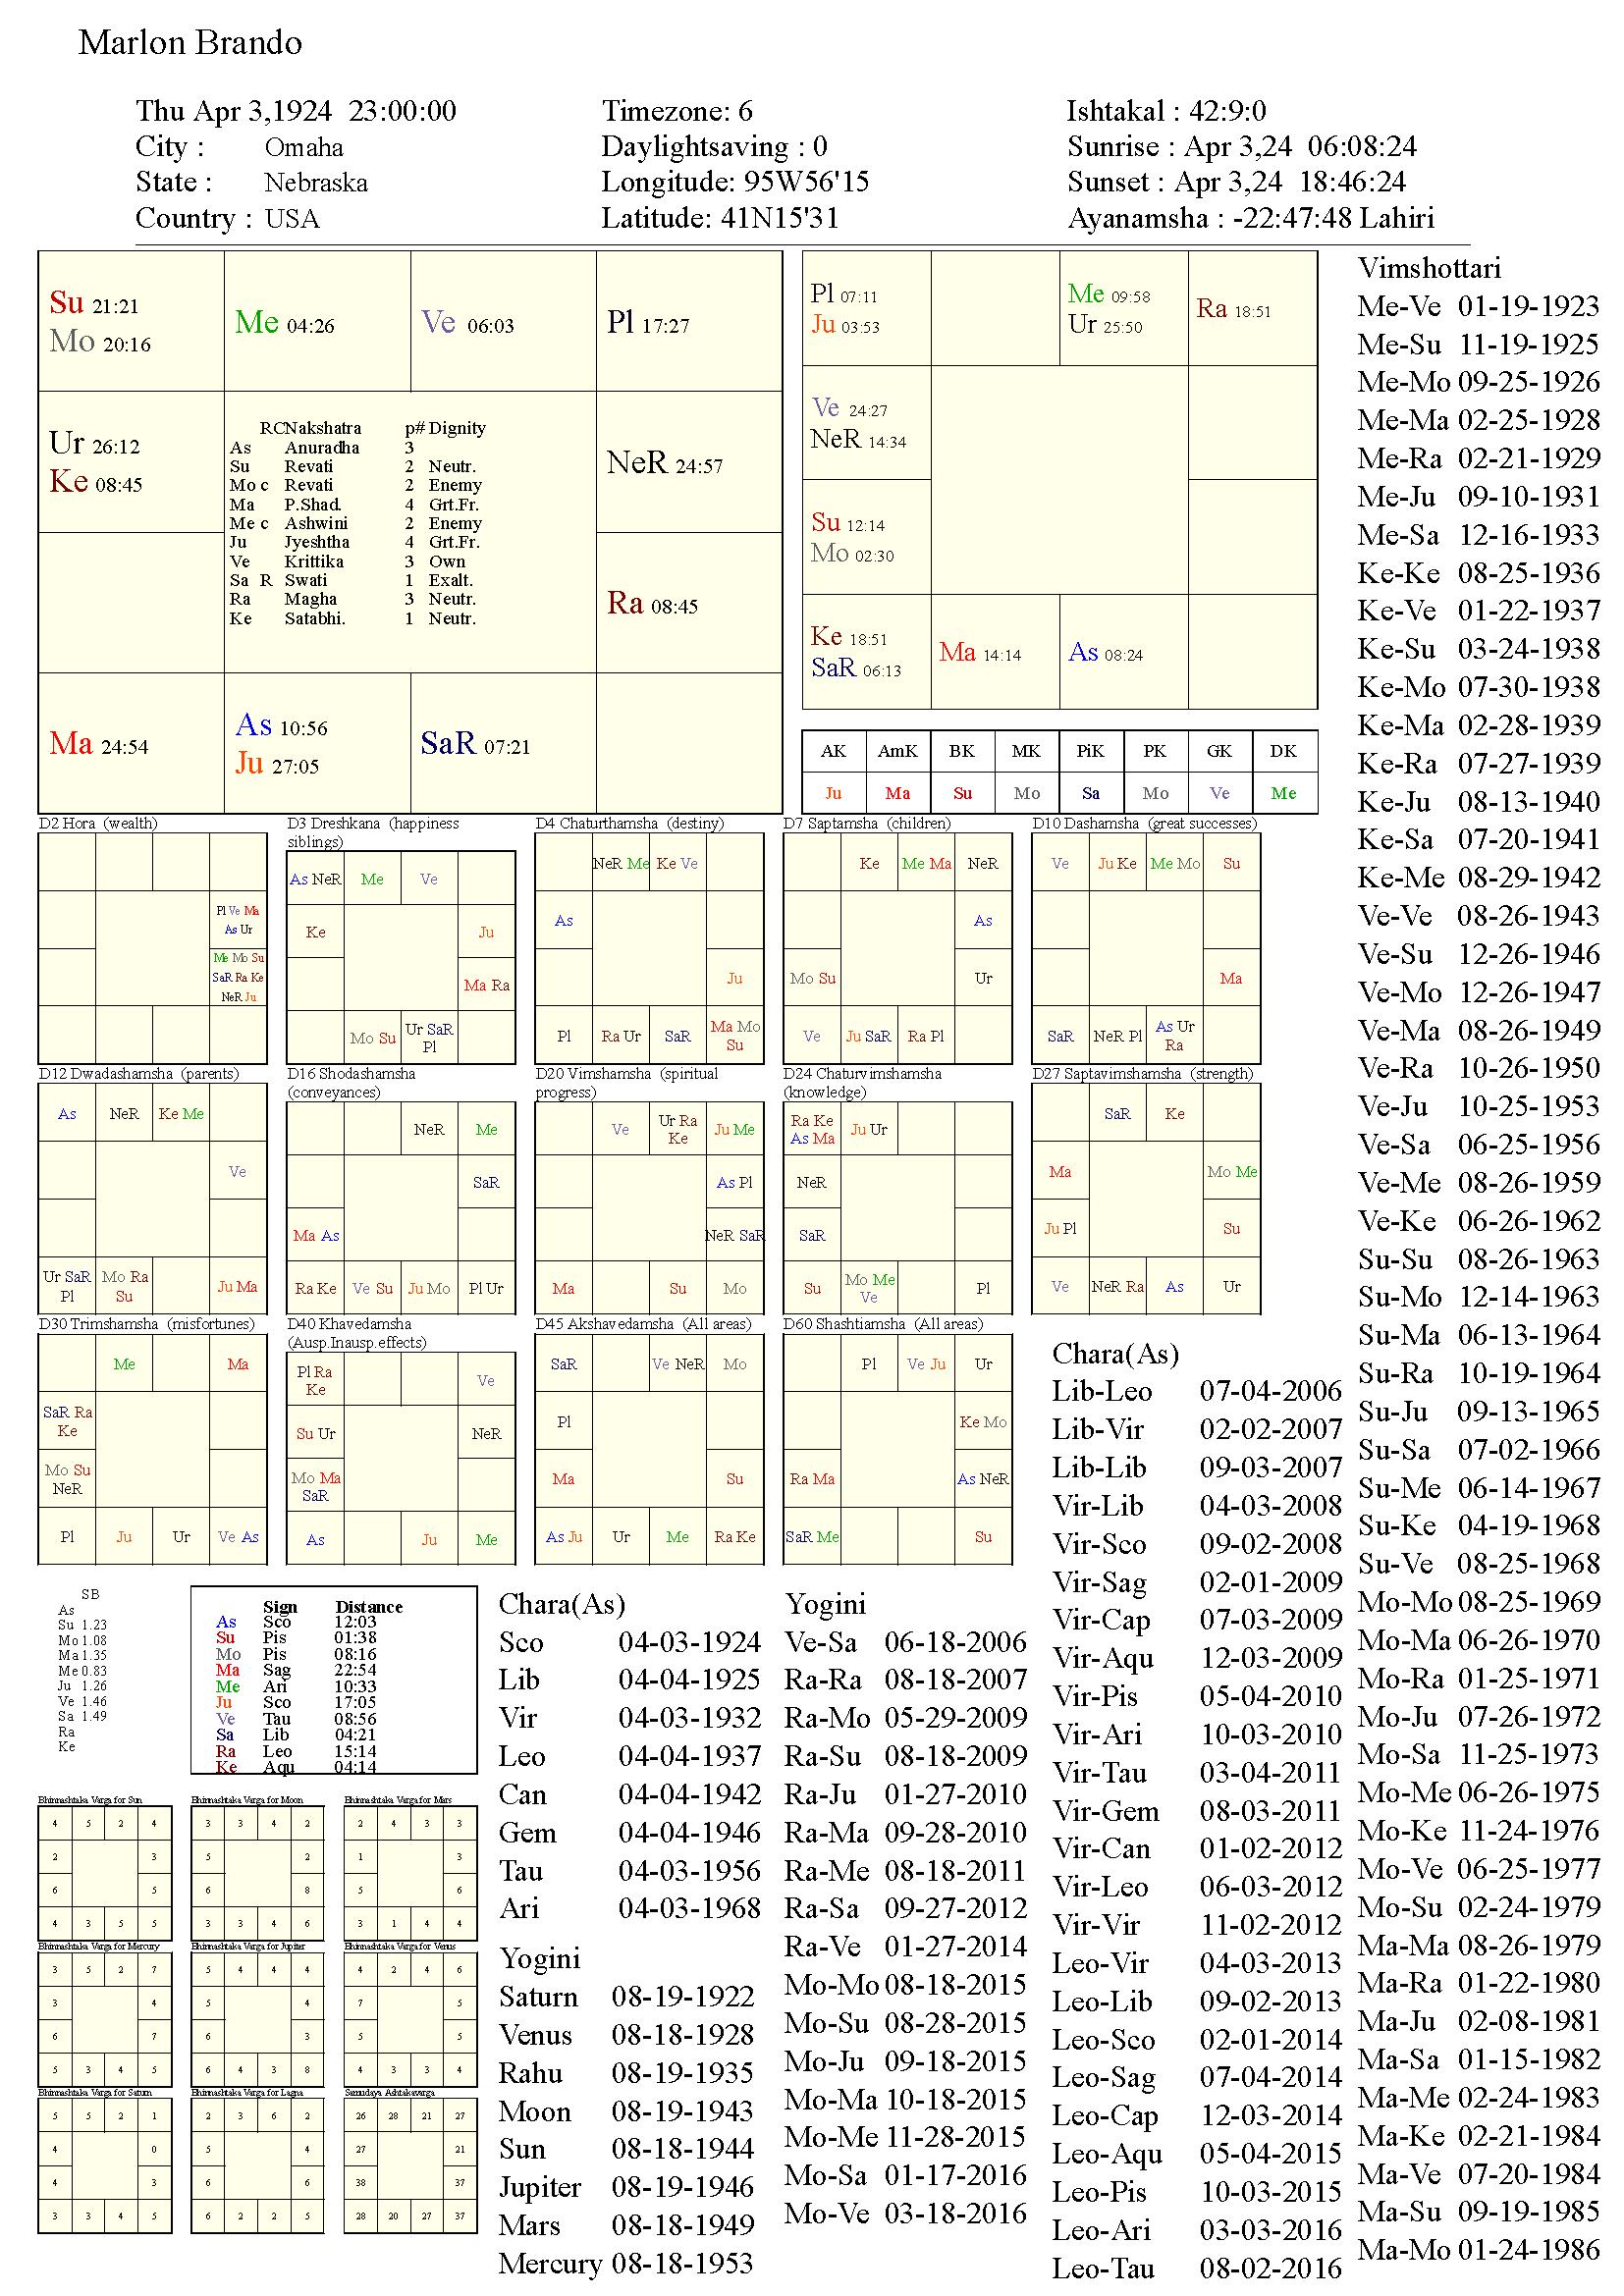 marlonbrando_chart